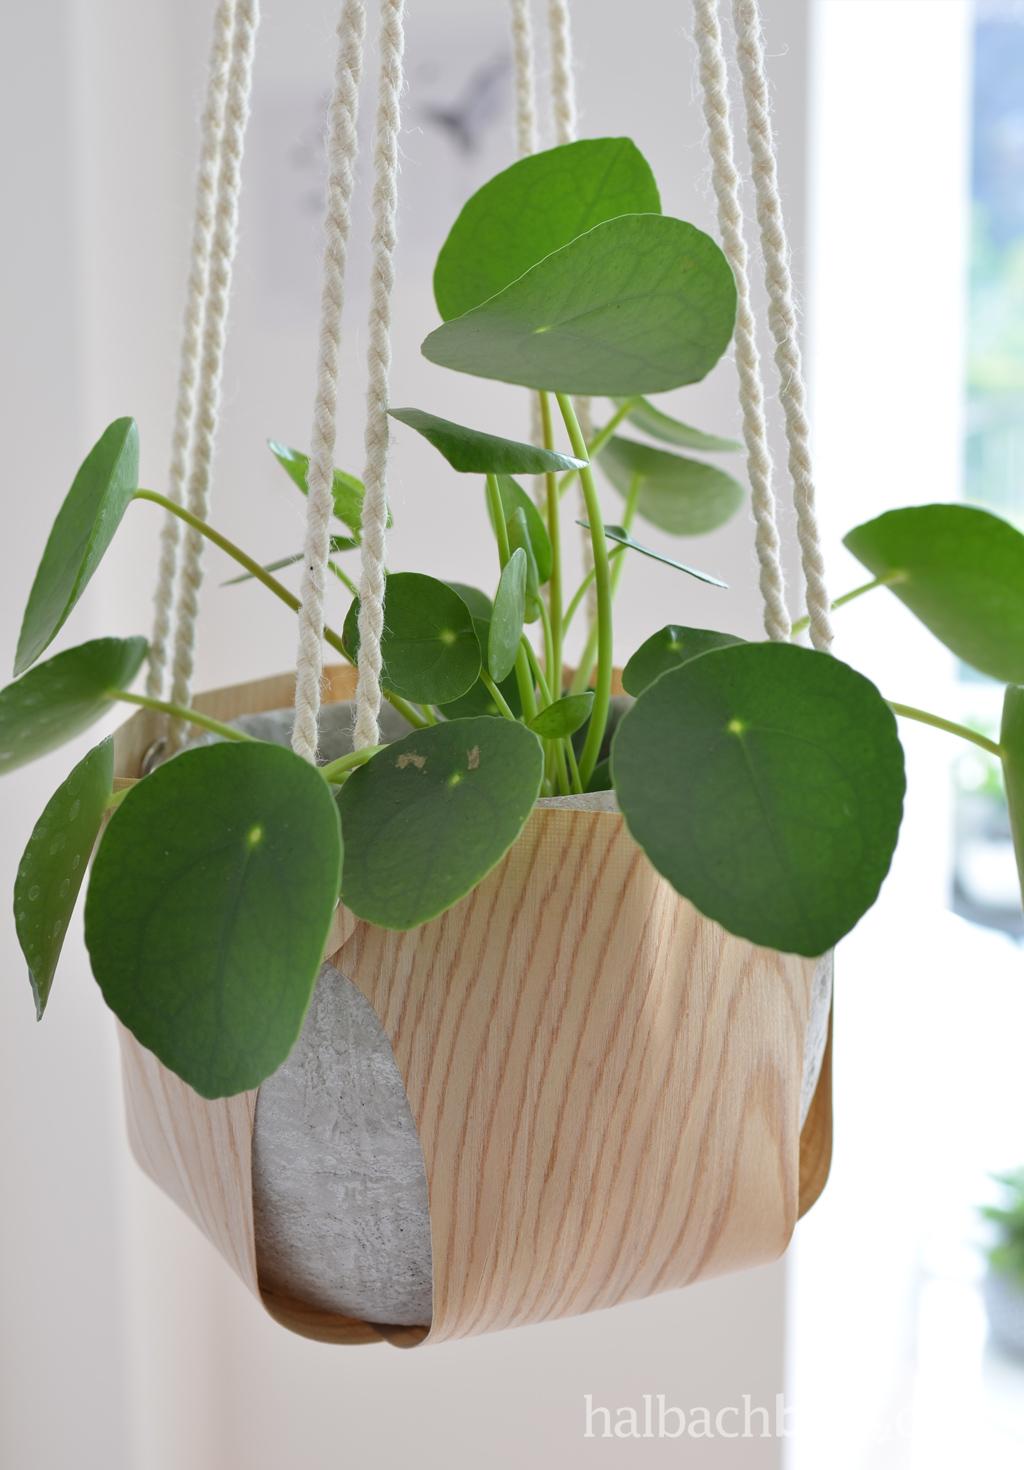 DIY-Tutorial halbachblog: Blumenampel aus Holzfurnier-Stoff nähen - graues Gefäß mit Pilea